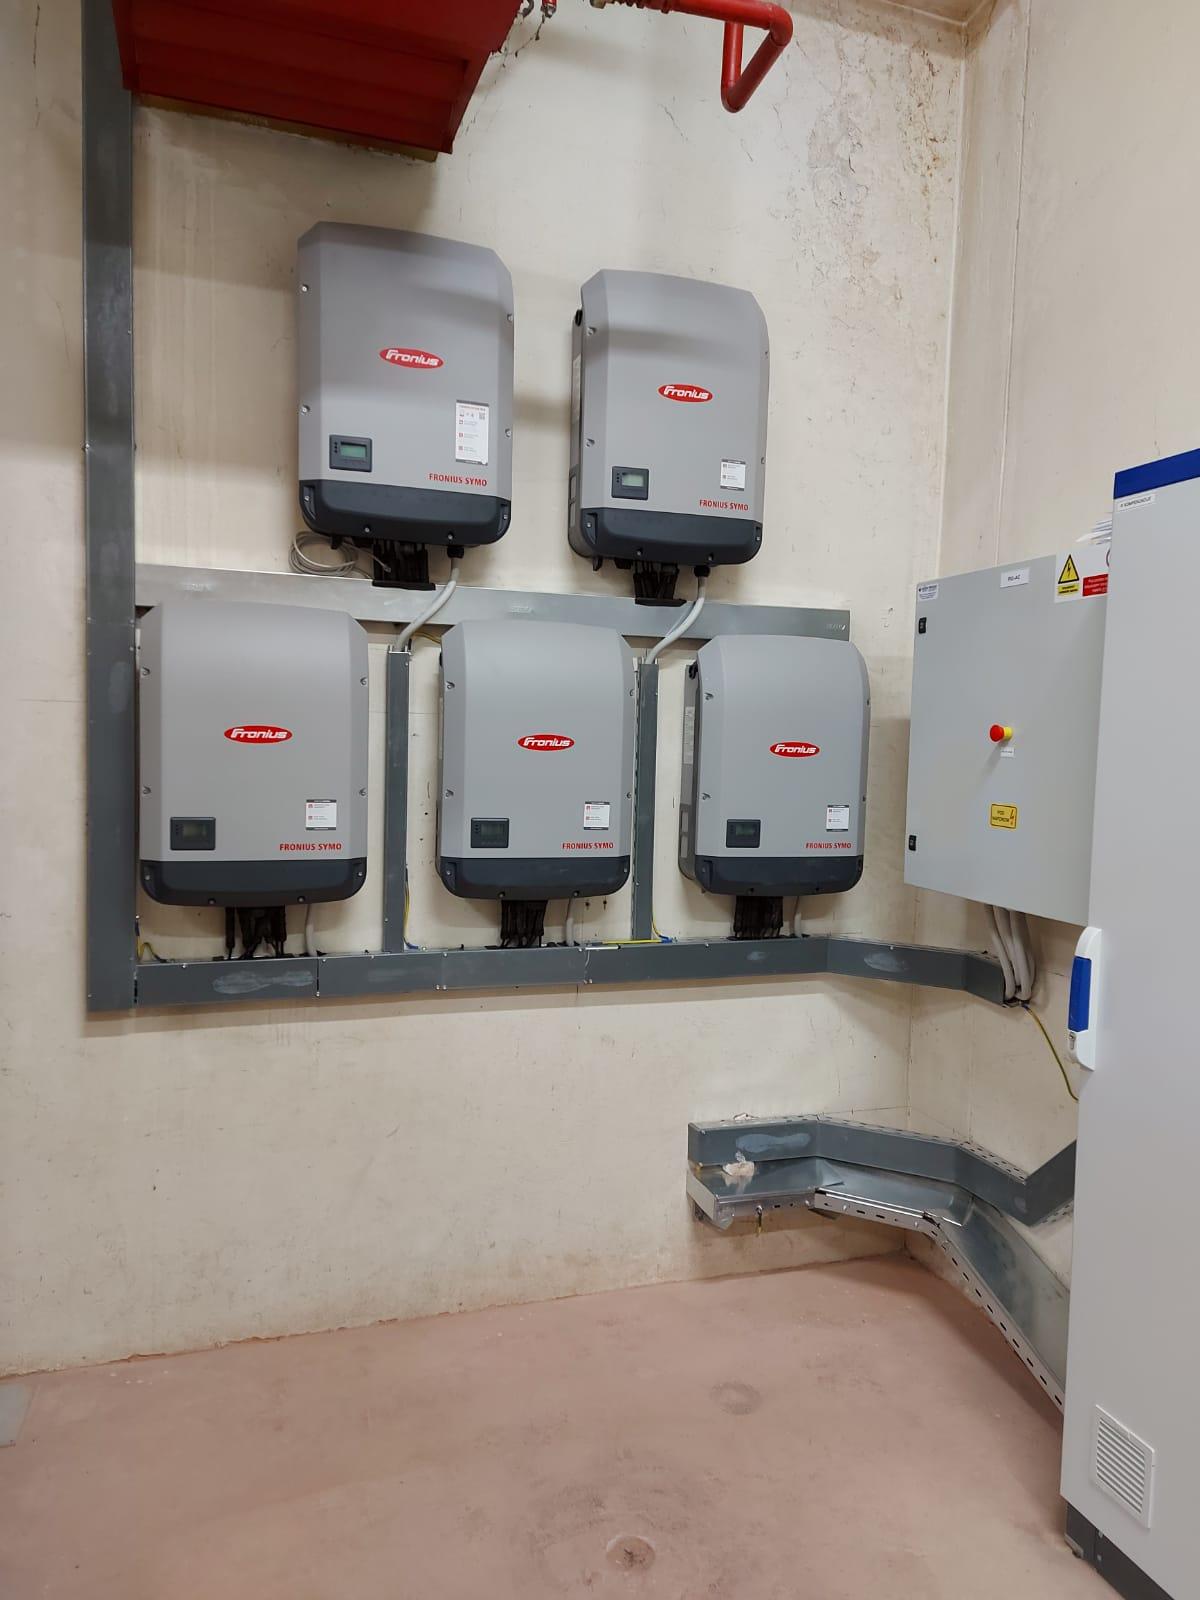 MURSKO SREDIŠĆE – 100 kWp